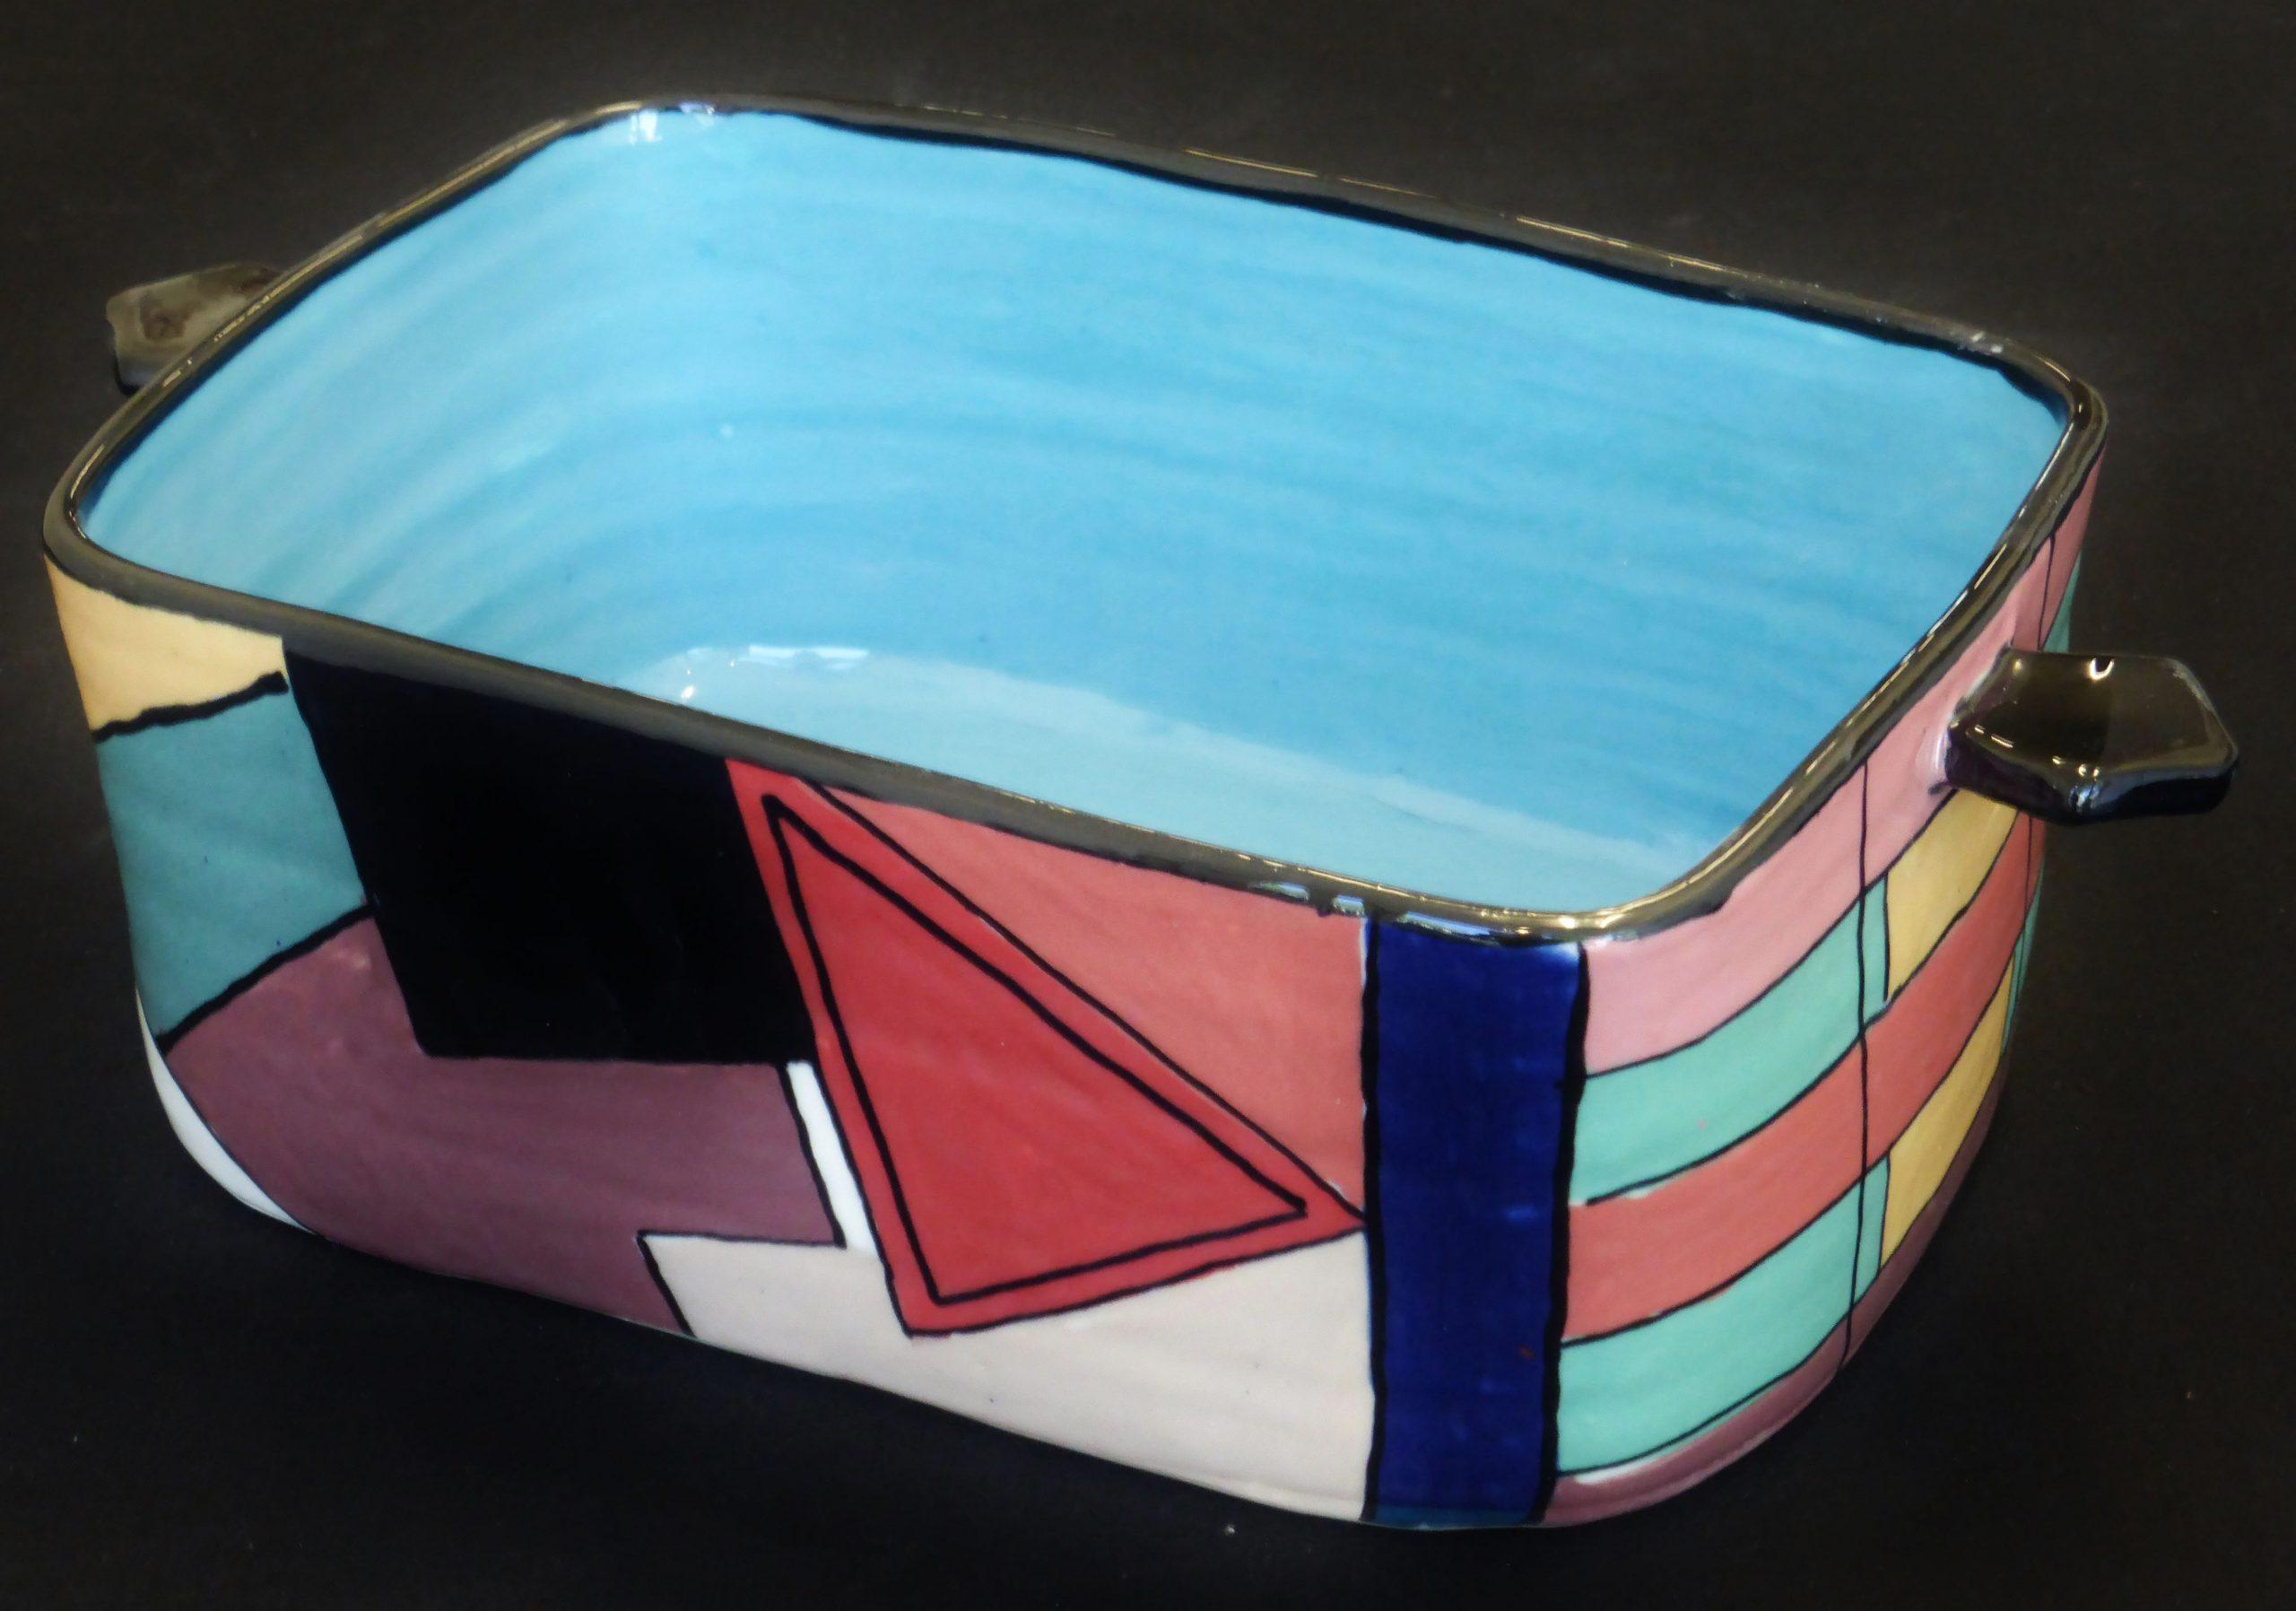 Basalt serviesgoed porselein ovenschaal geometrisch vrij